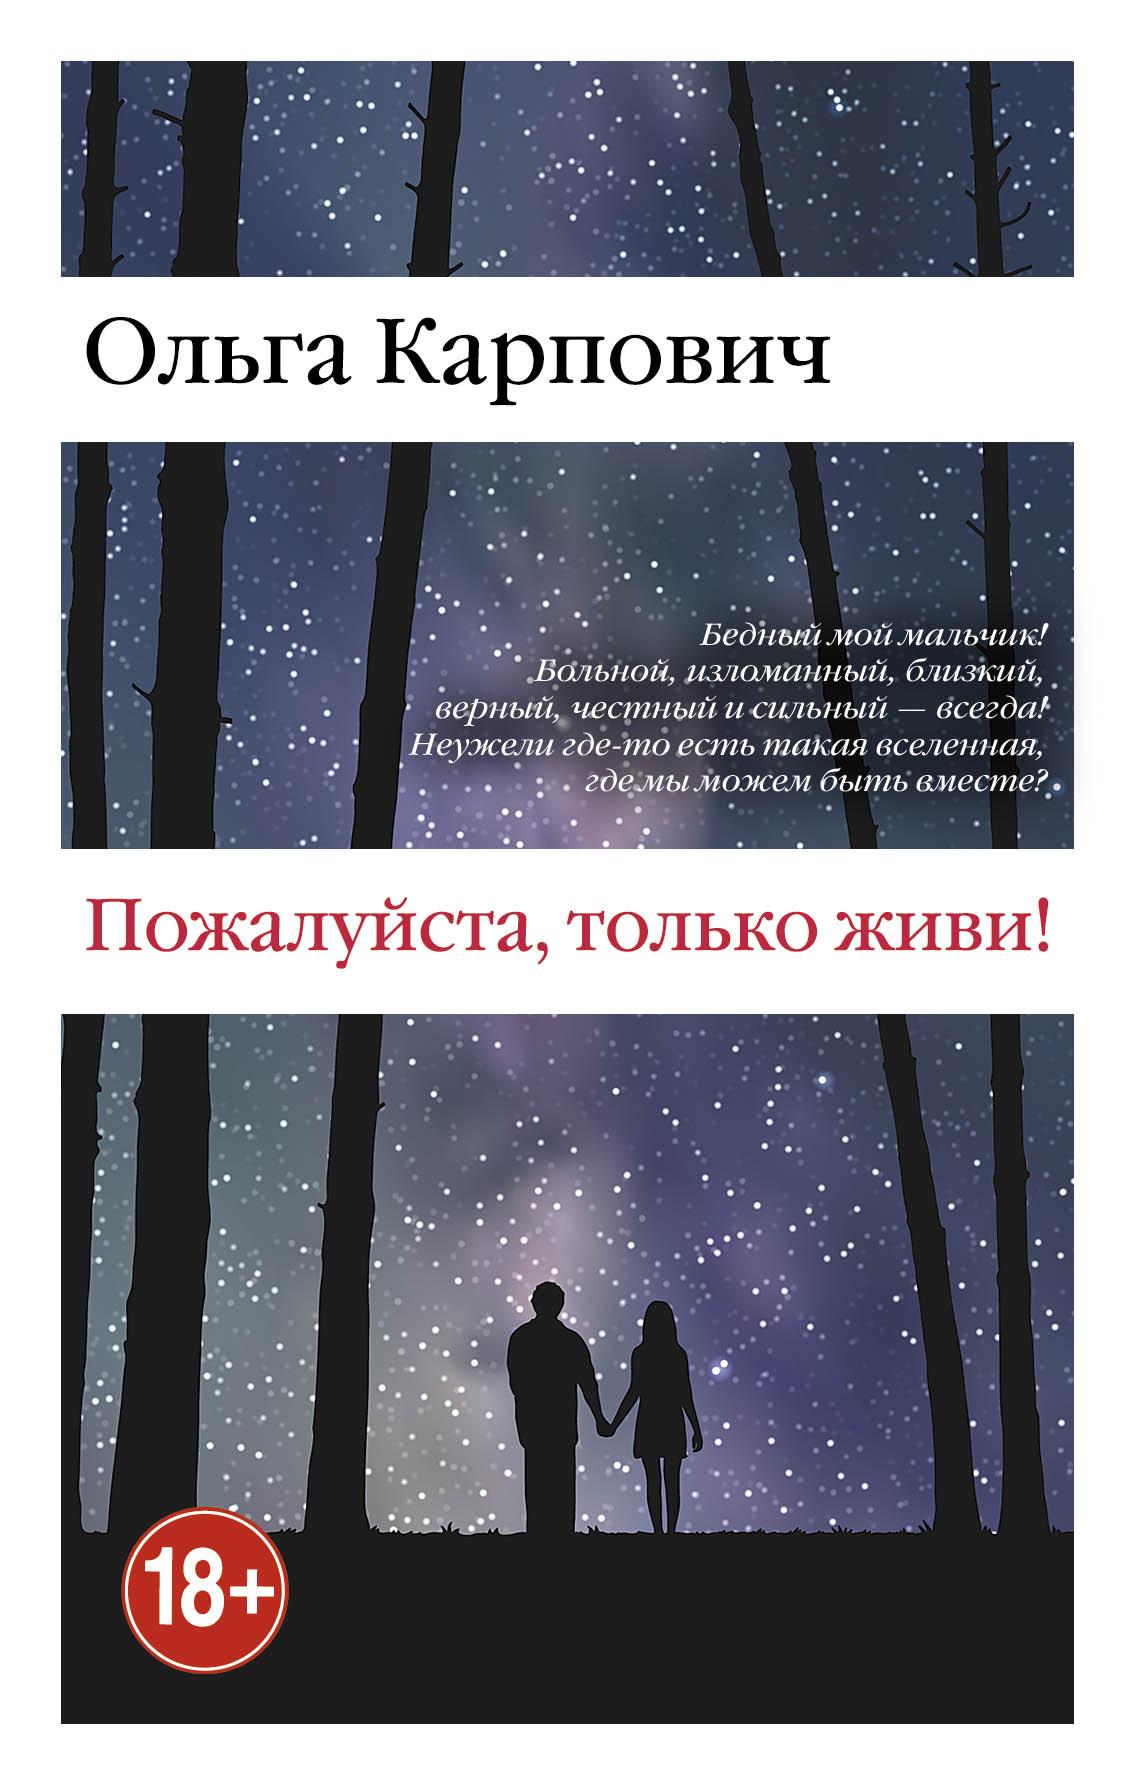 Ольга Карпович Пожалуйста, только живи! пожалуйста только живи